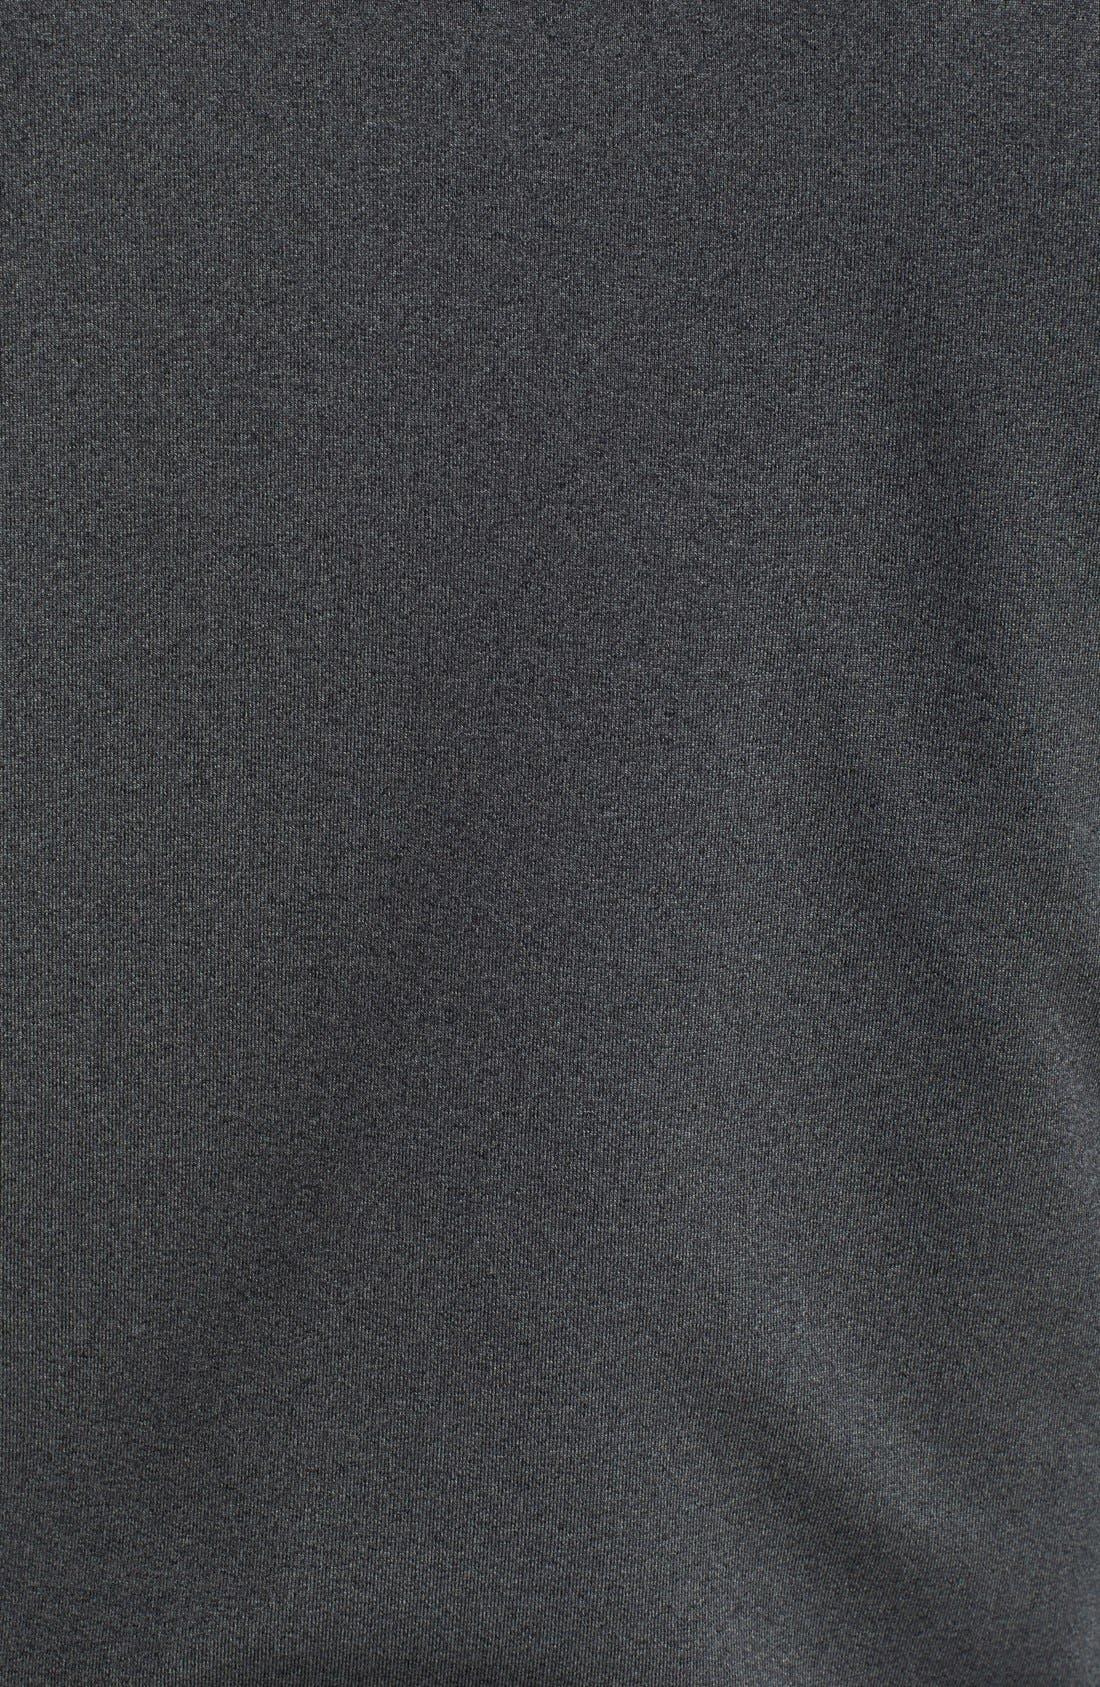 Alternate Image 3  - Victorinox Swiss Army® Moisture Wicking Technical Fleece Hooded Jacket (Online Only)